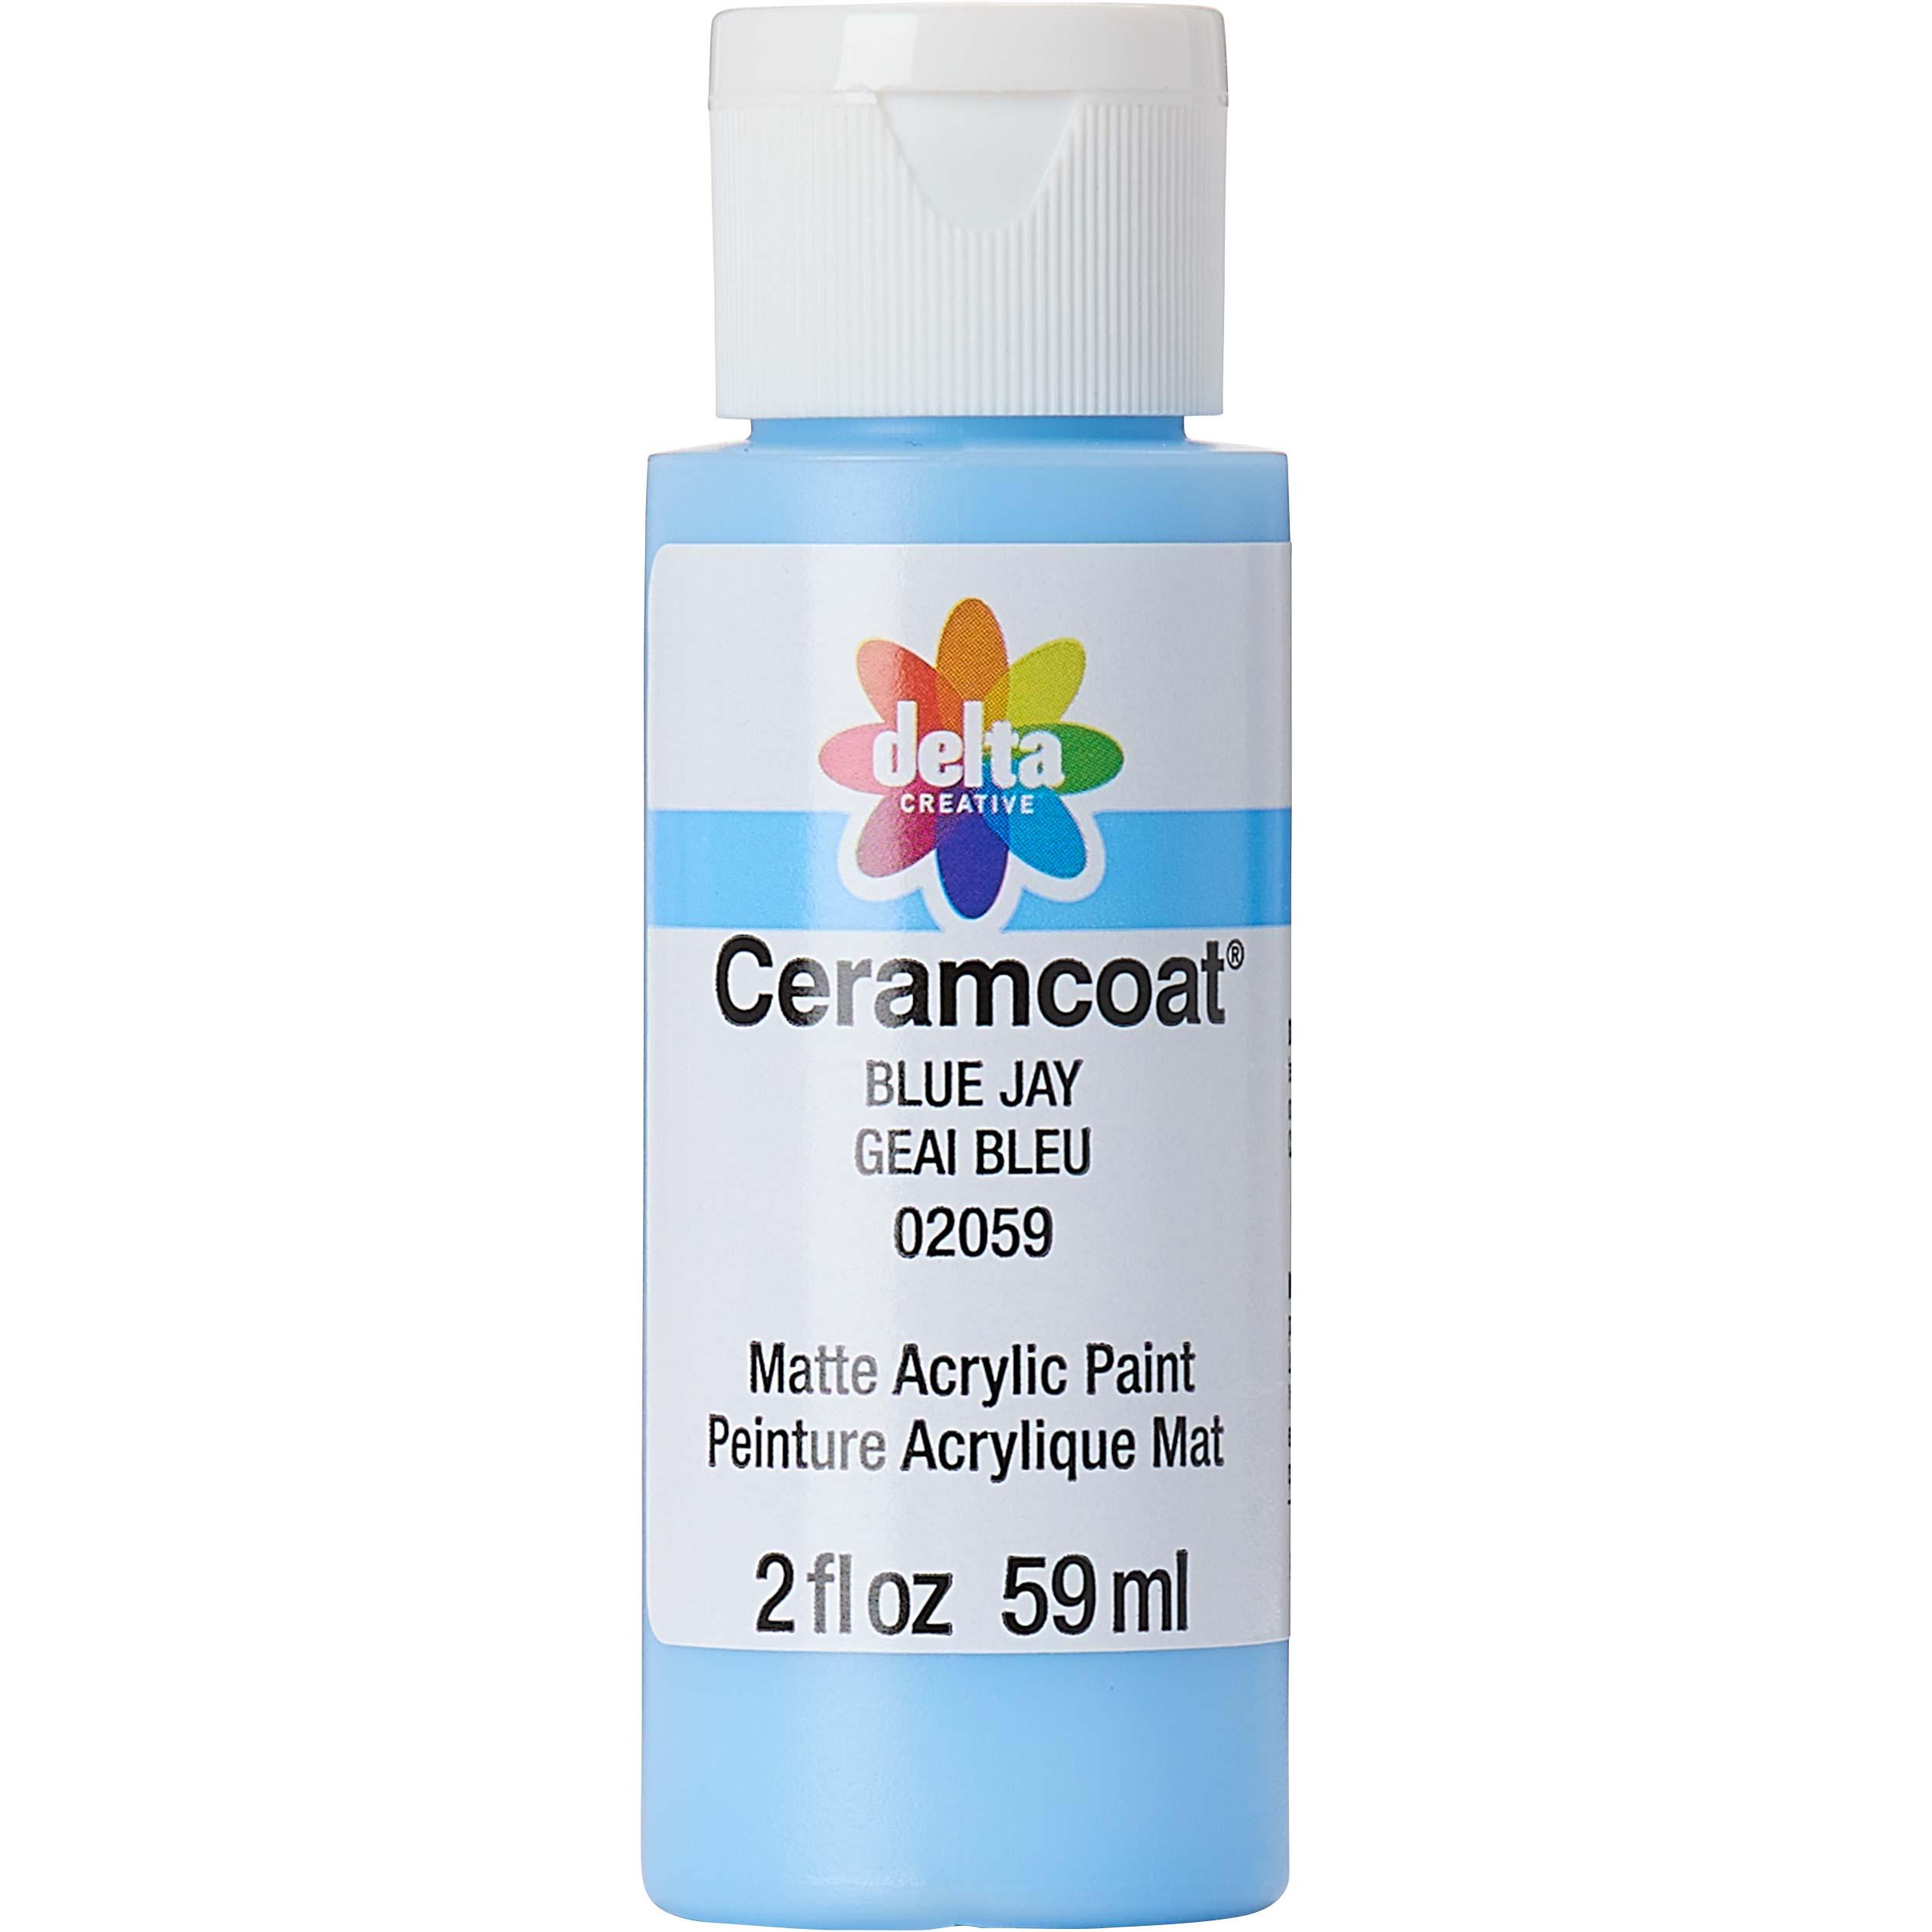 Delta Ceramcoat ® Acrylic Paint - Blue Jay, 2 oz.